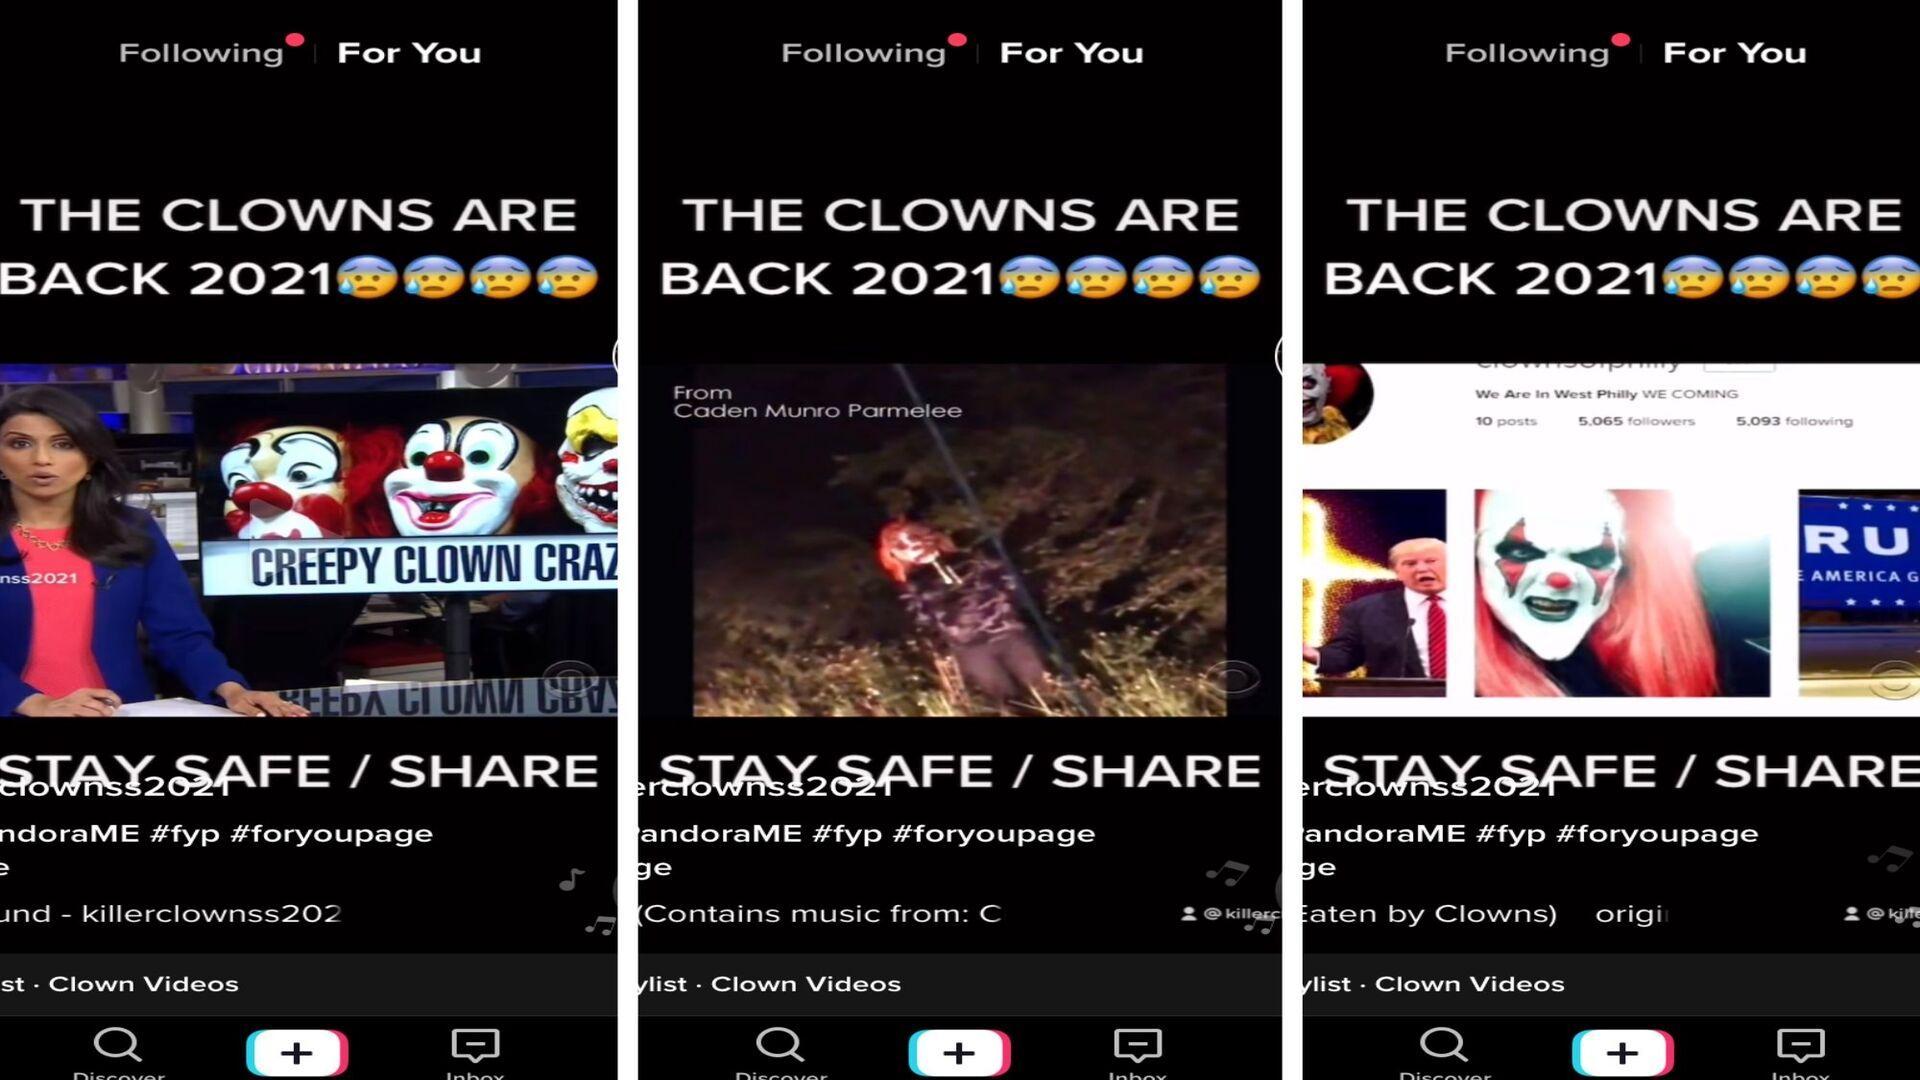 Creepy Killer Clown Craze Happening Again!?!